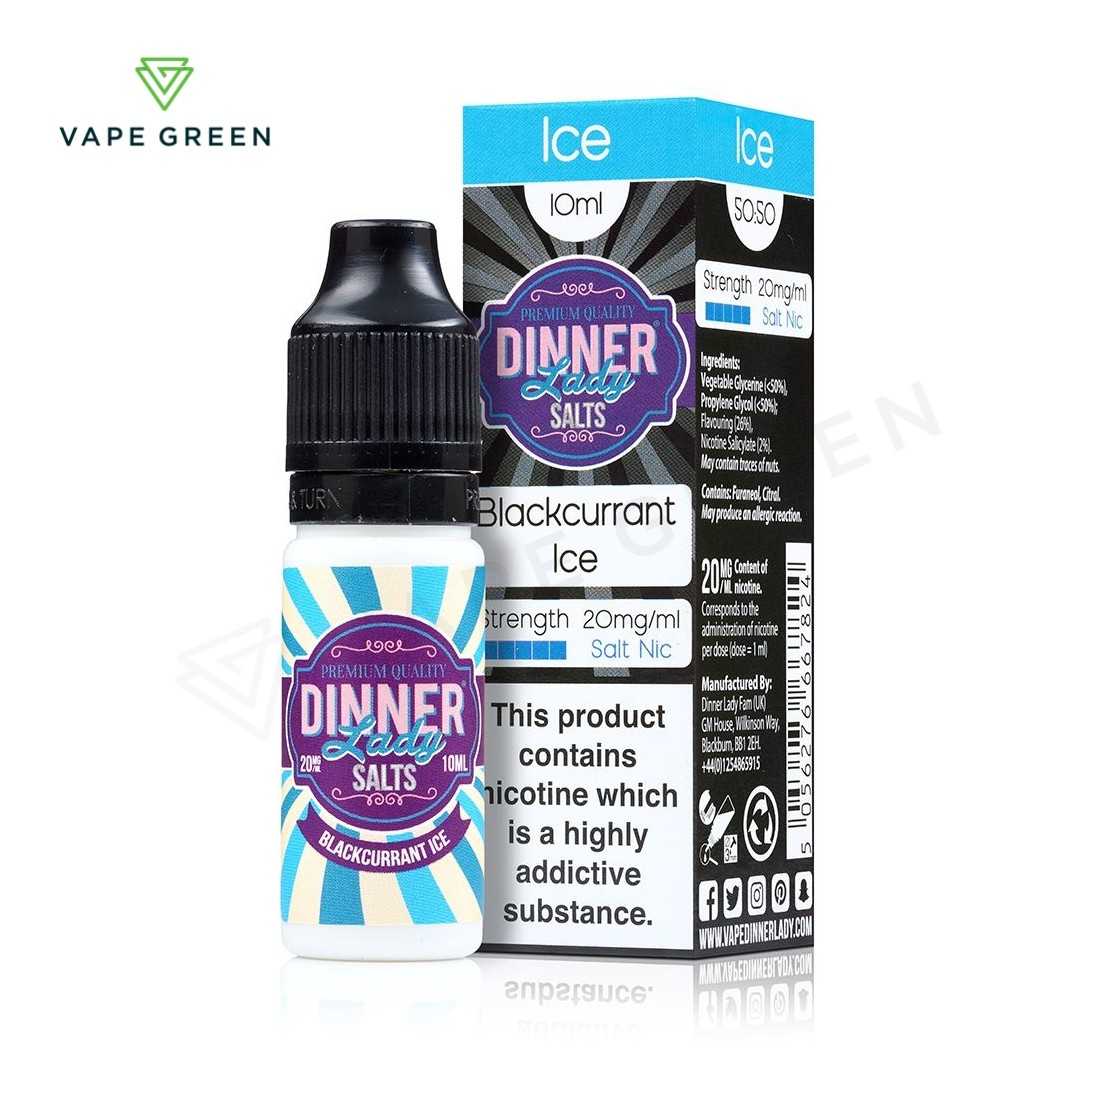 Blackcurrant Ice eLiquid by Dinner Lady Salts